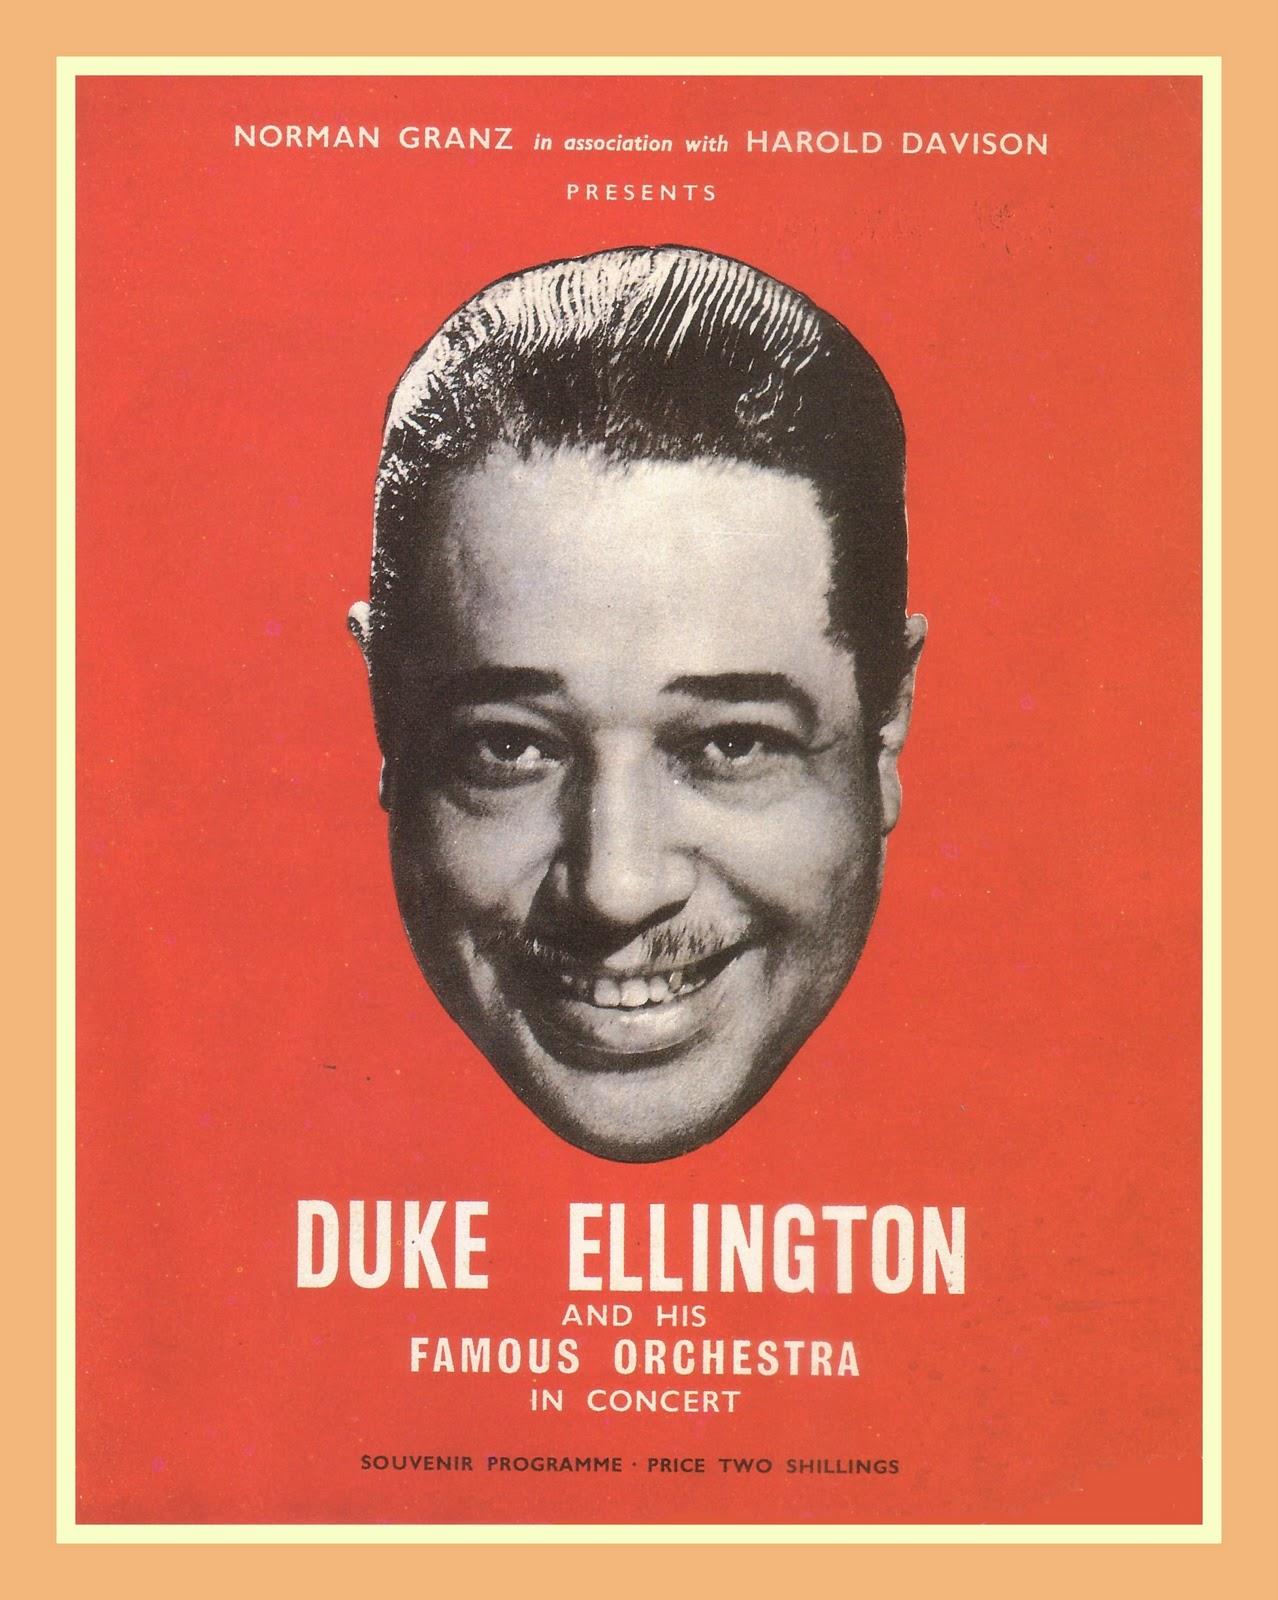 duke essay 1 duke ellington essay custom writing essays training and film connu jazz profiles duke ellington red program archivehtml duke ellington essay duke